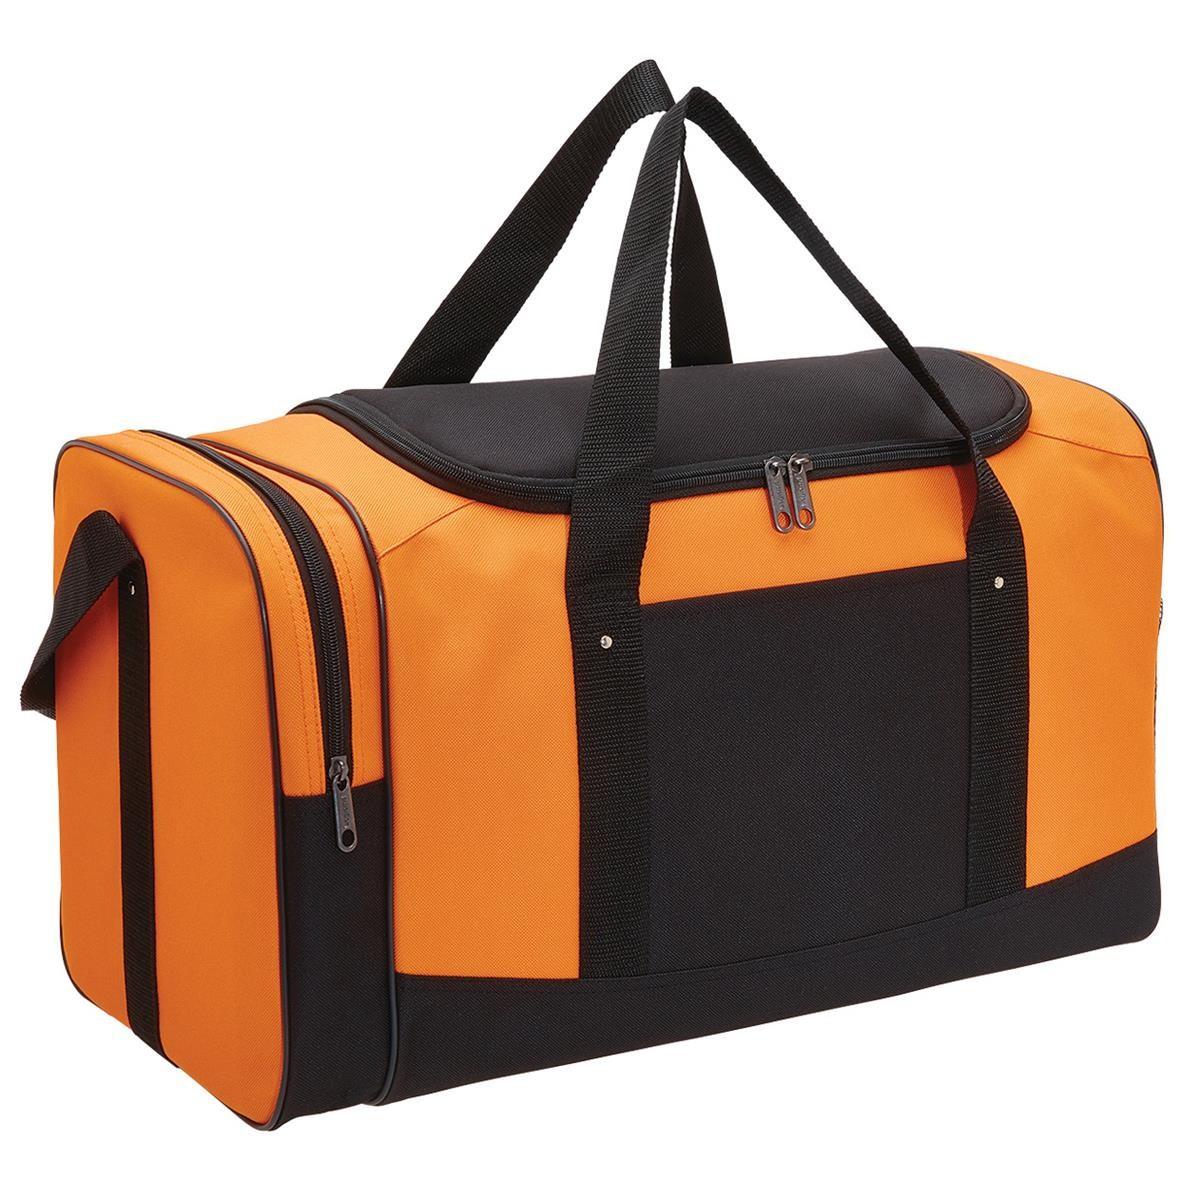 Spark Sports Bag - Orange & Black